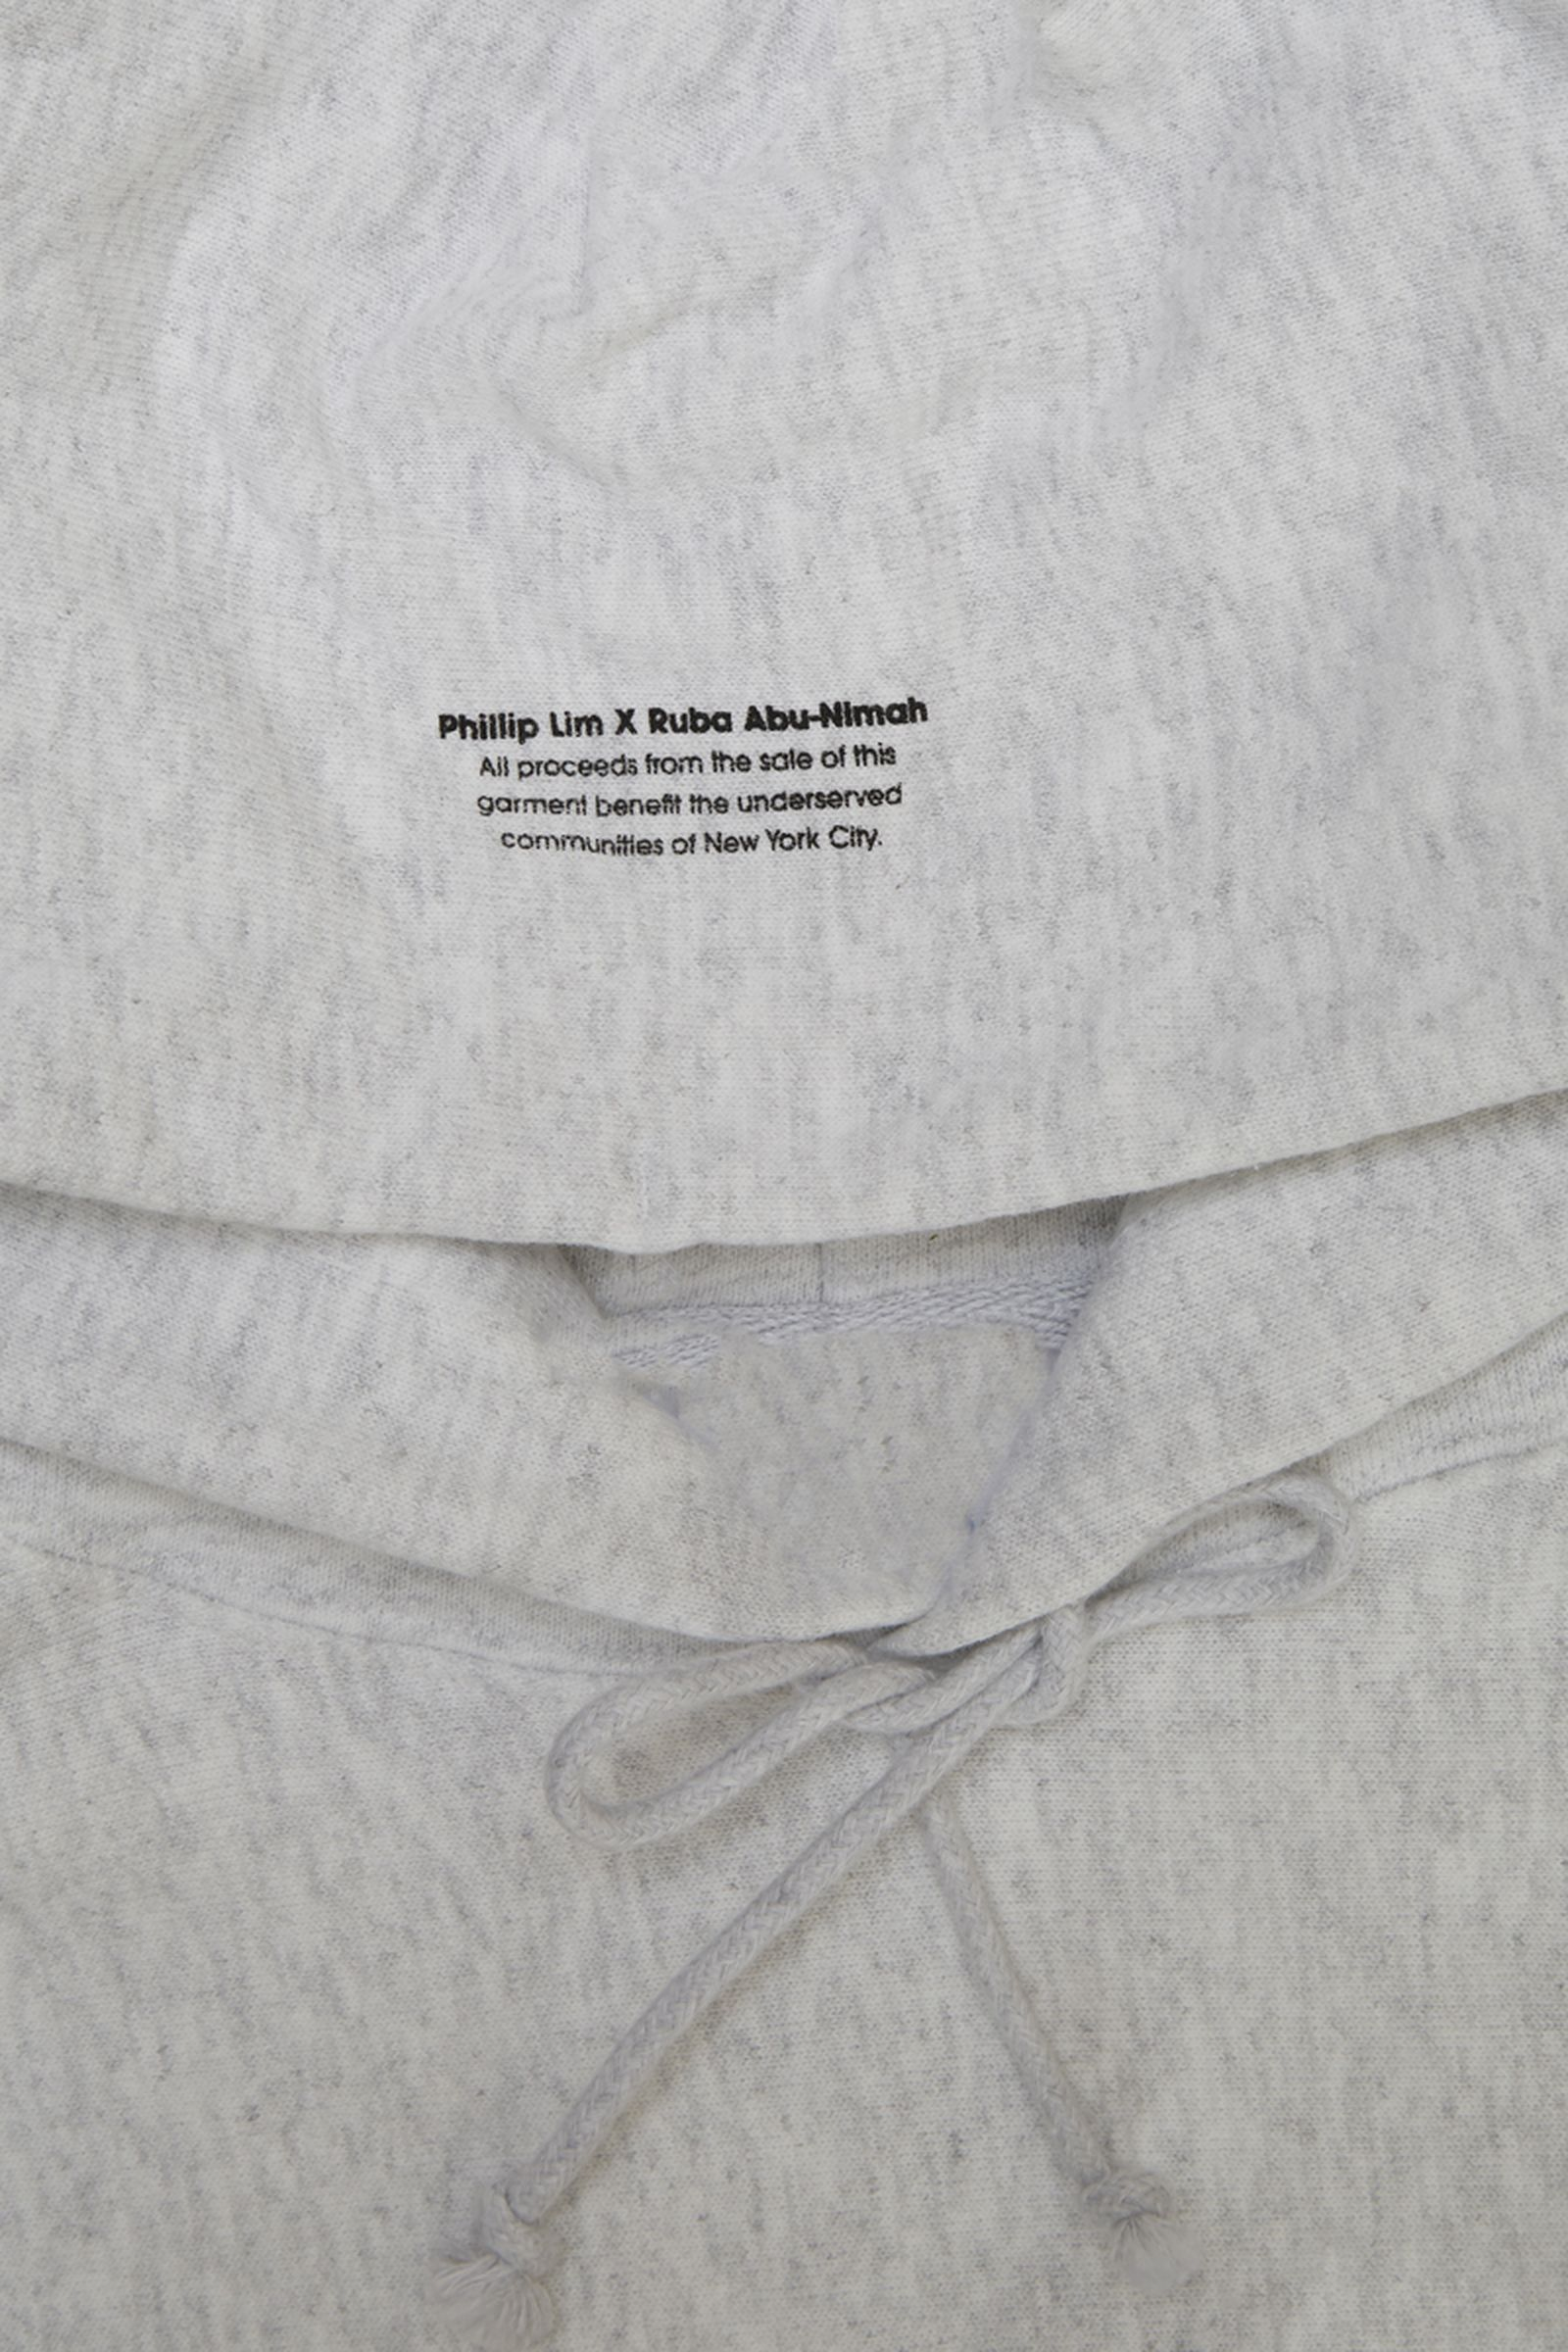 ruba-phillip-lim-hoodie-04